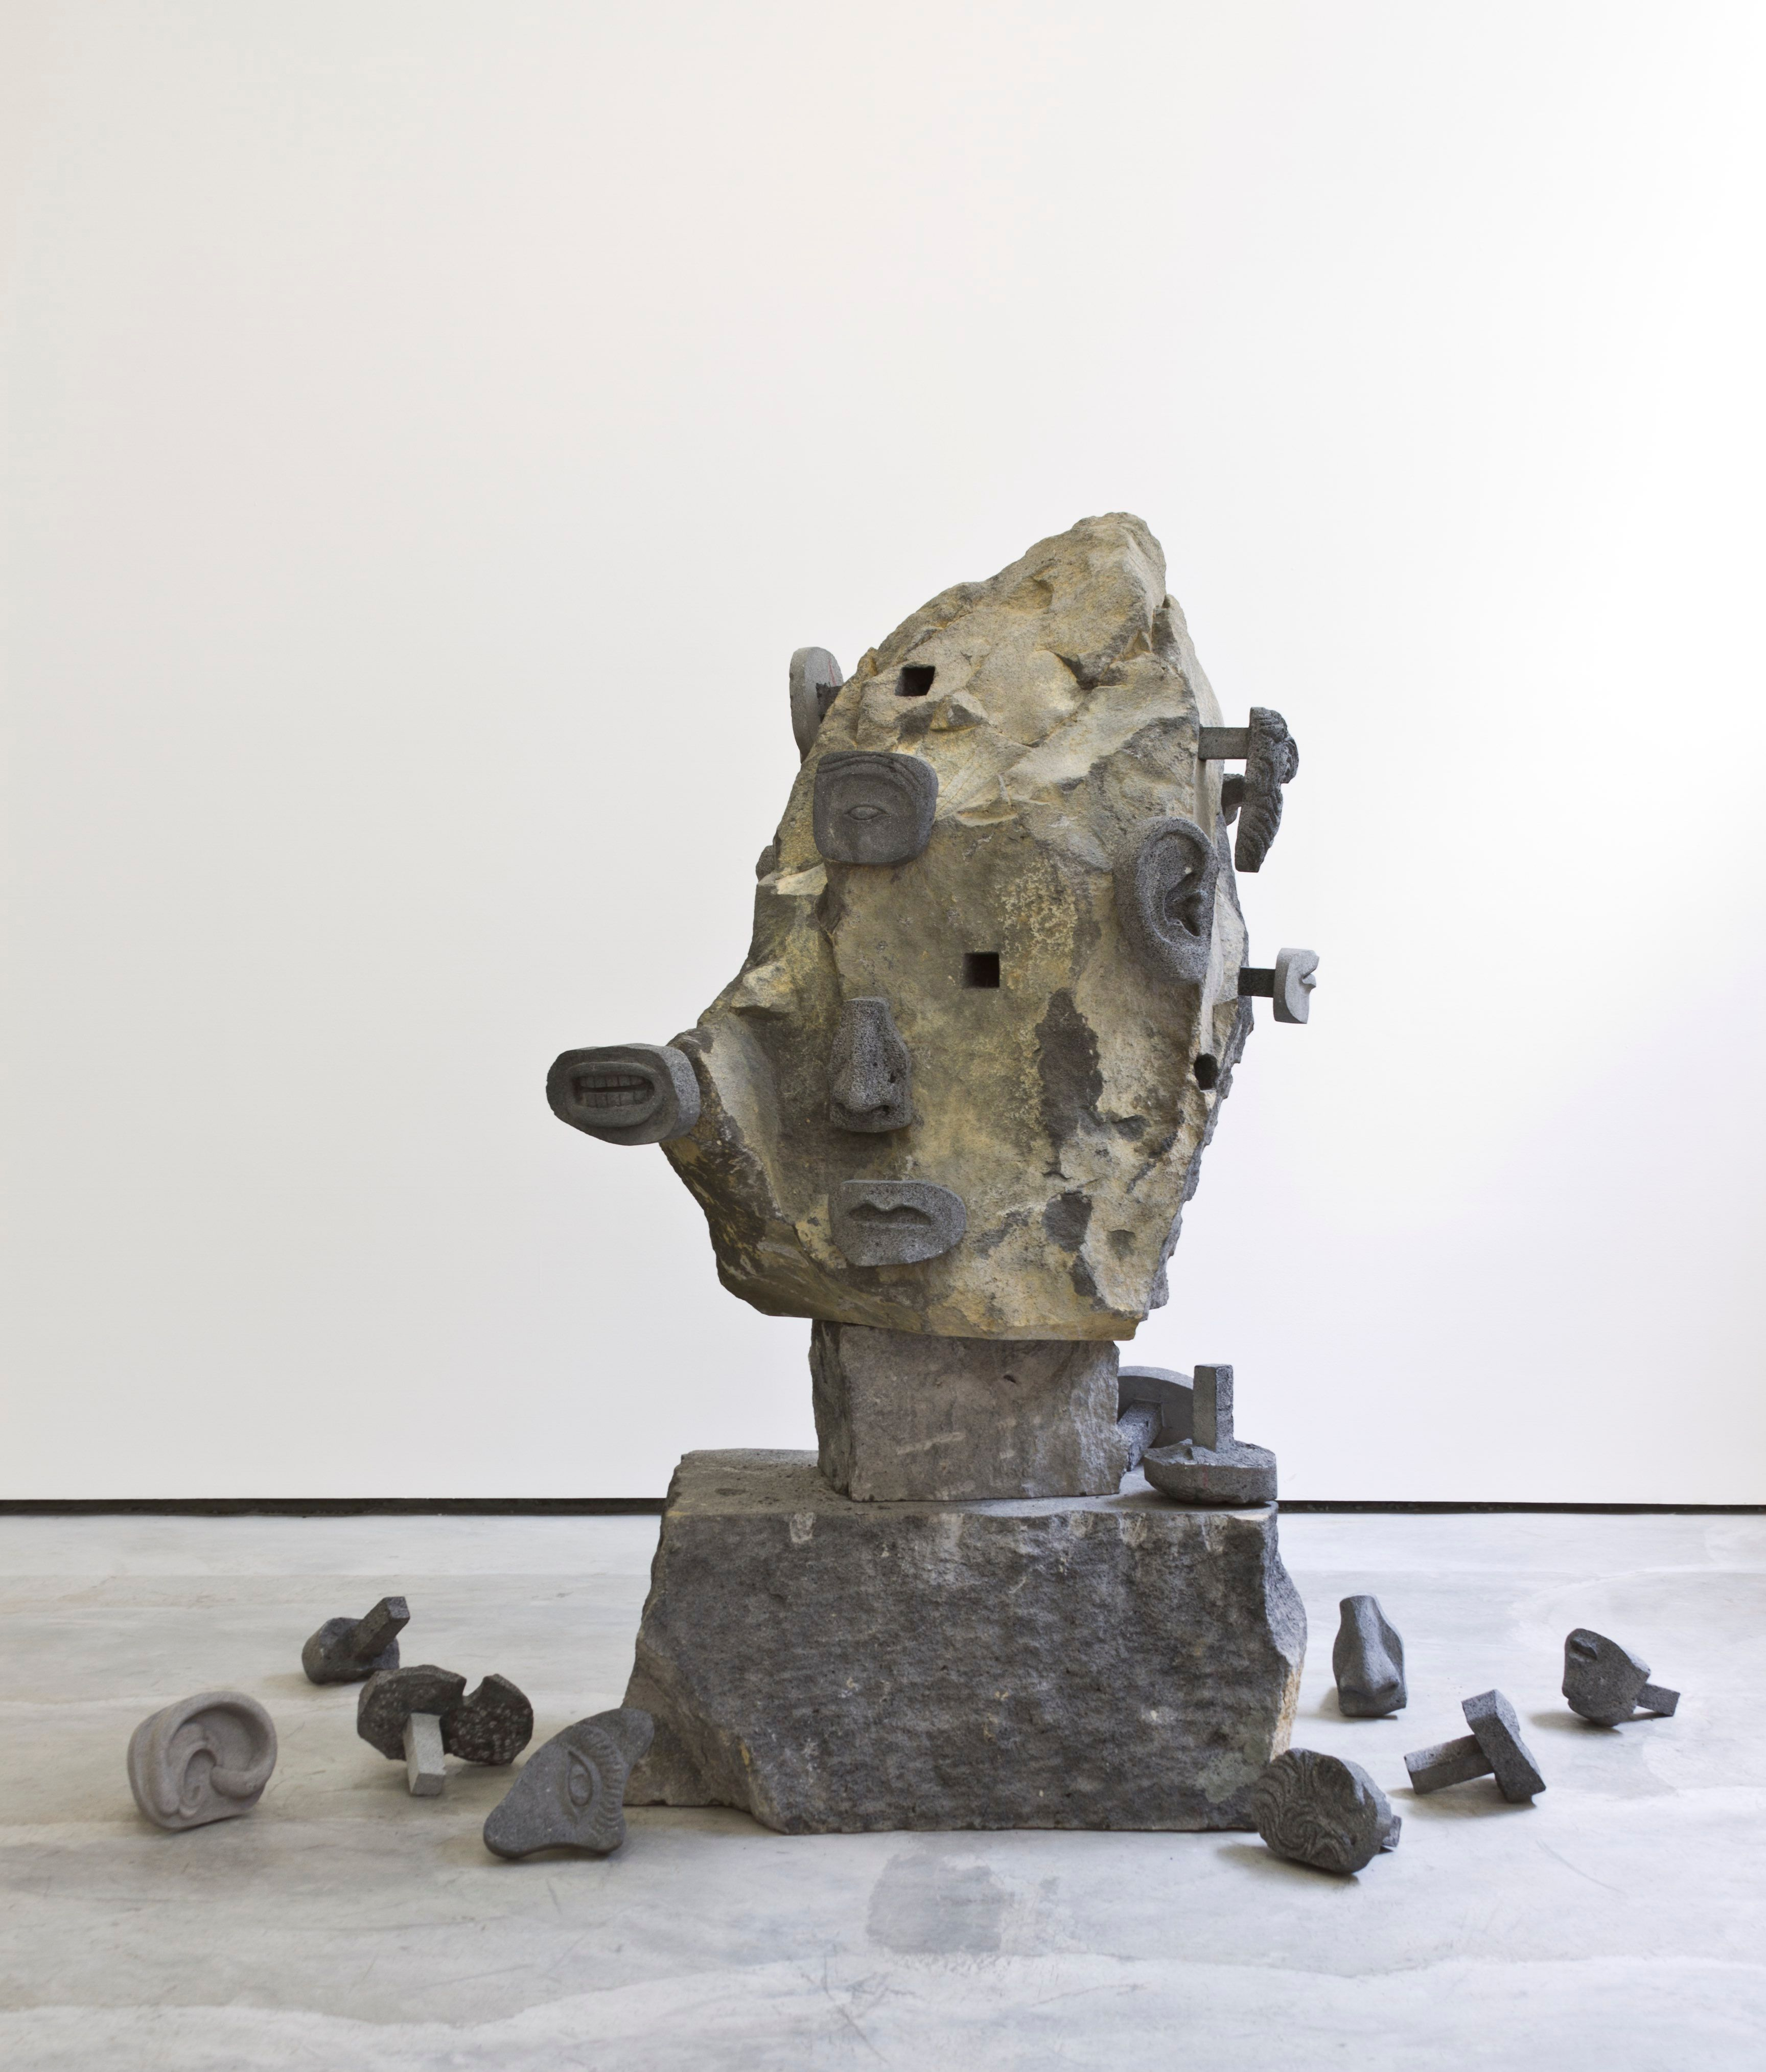 Pico della Mirandola (recinto de ozumba) | Piedra tallada | 160 x 80 x 65 cm | 2012